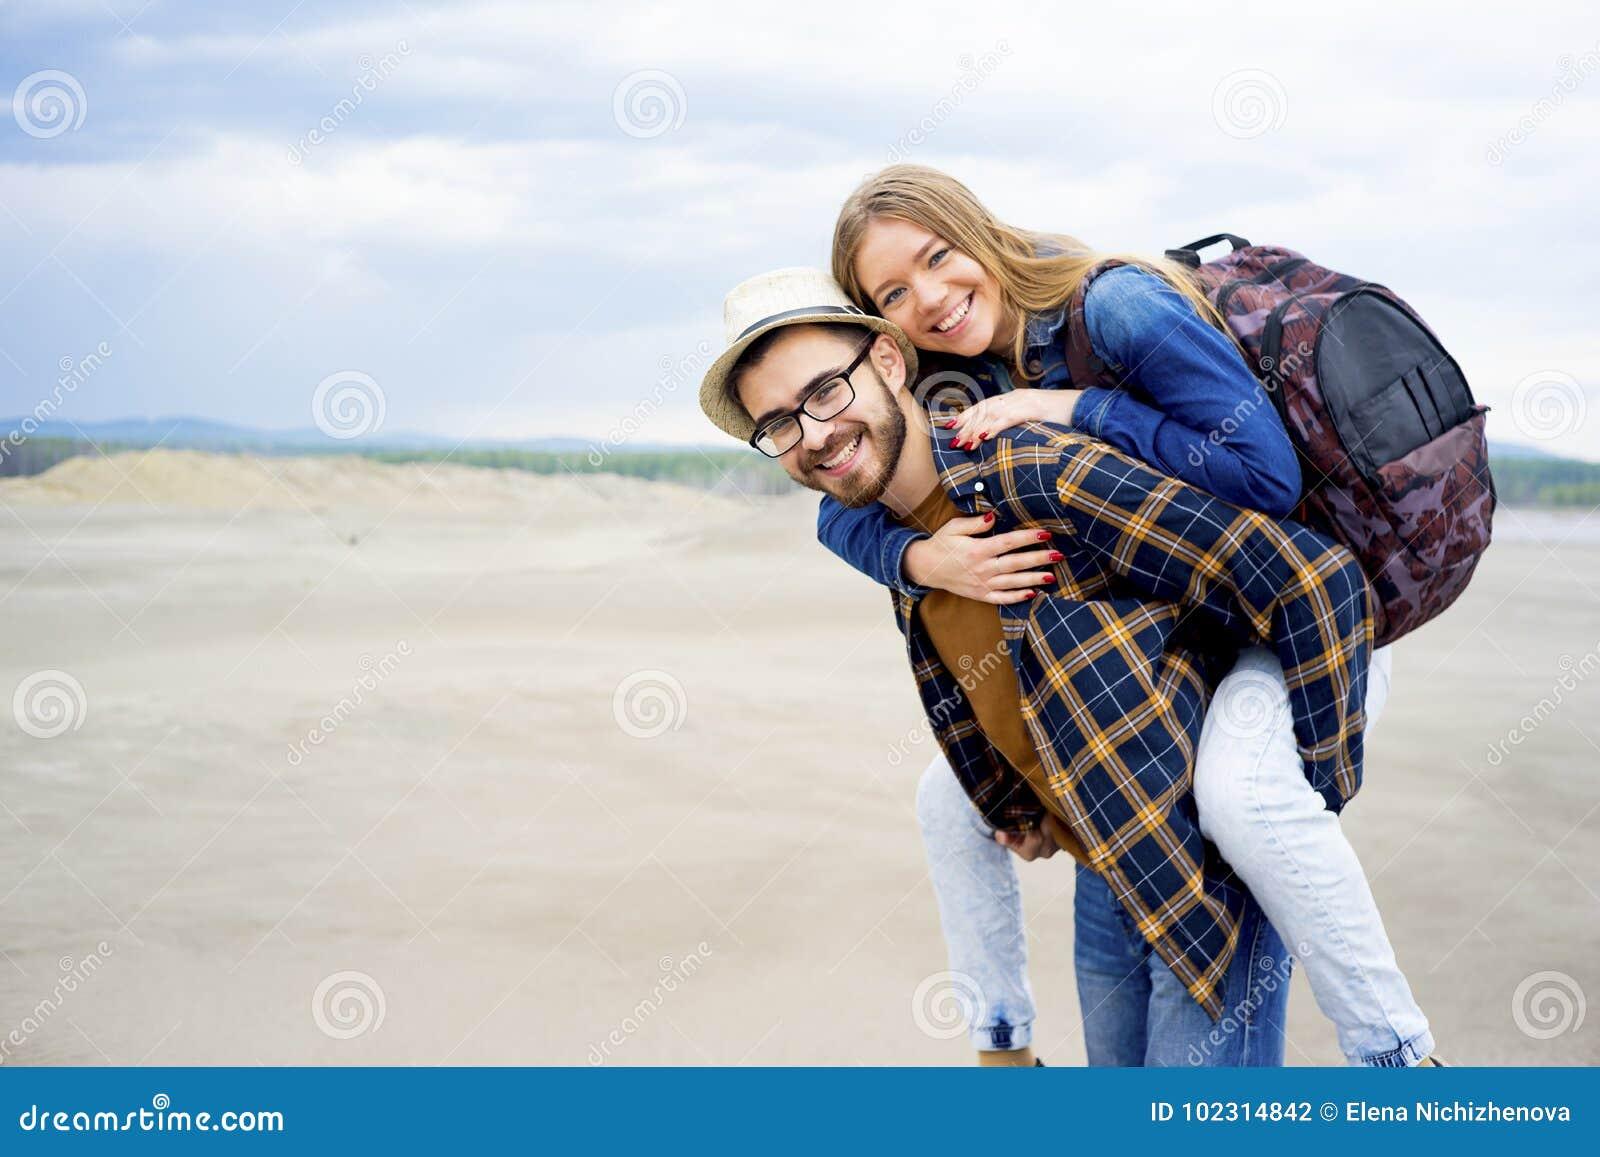 Image of: Painting Portrait Of Travelers In Desert Dreamstimecom Travelers In Desert Stock Photo Image Of Adventure 102314842